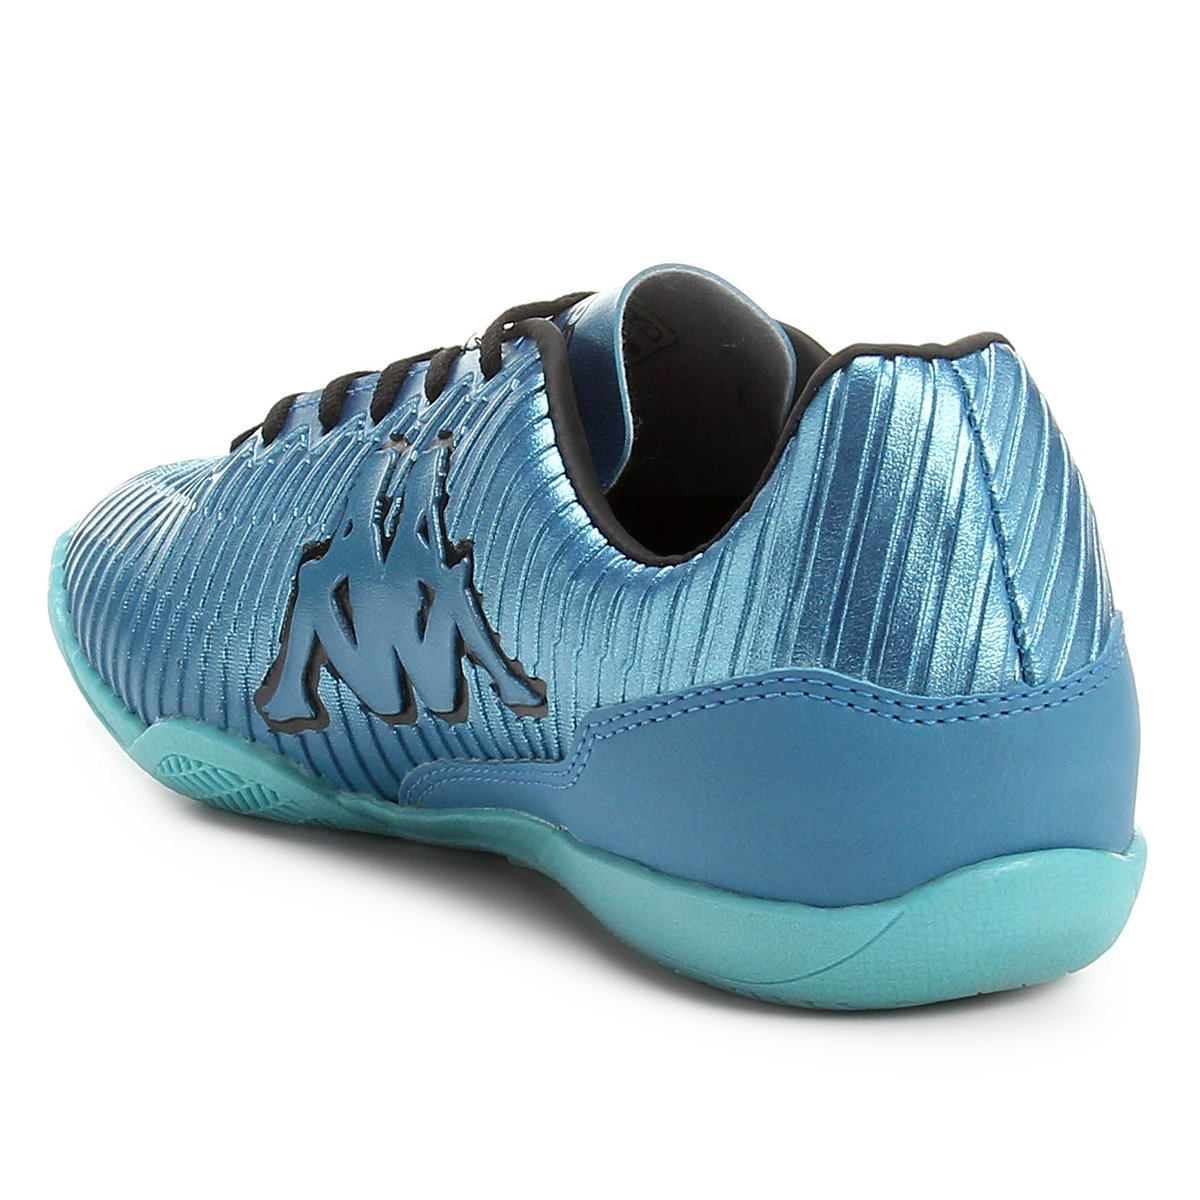 f1860866e7 Chuteira Futsal Kappa Tibre - Azul Turquesa e Azul Claro - Compre ...